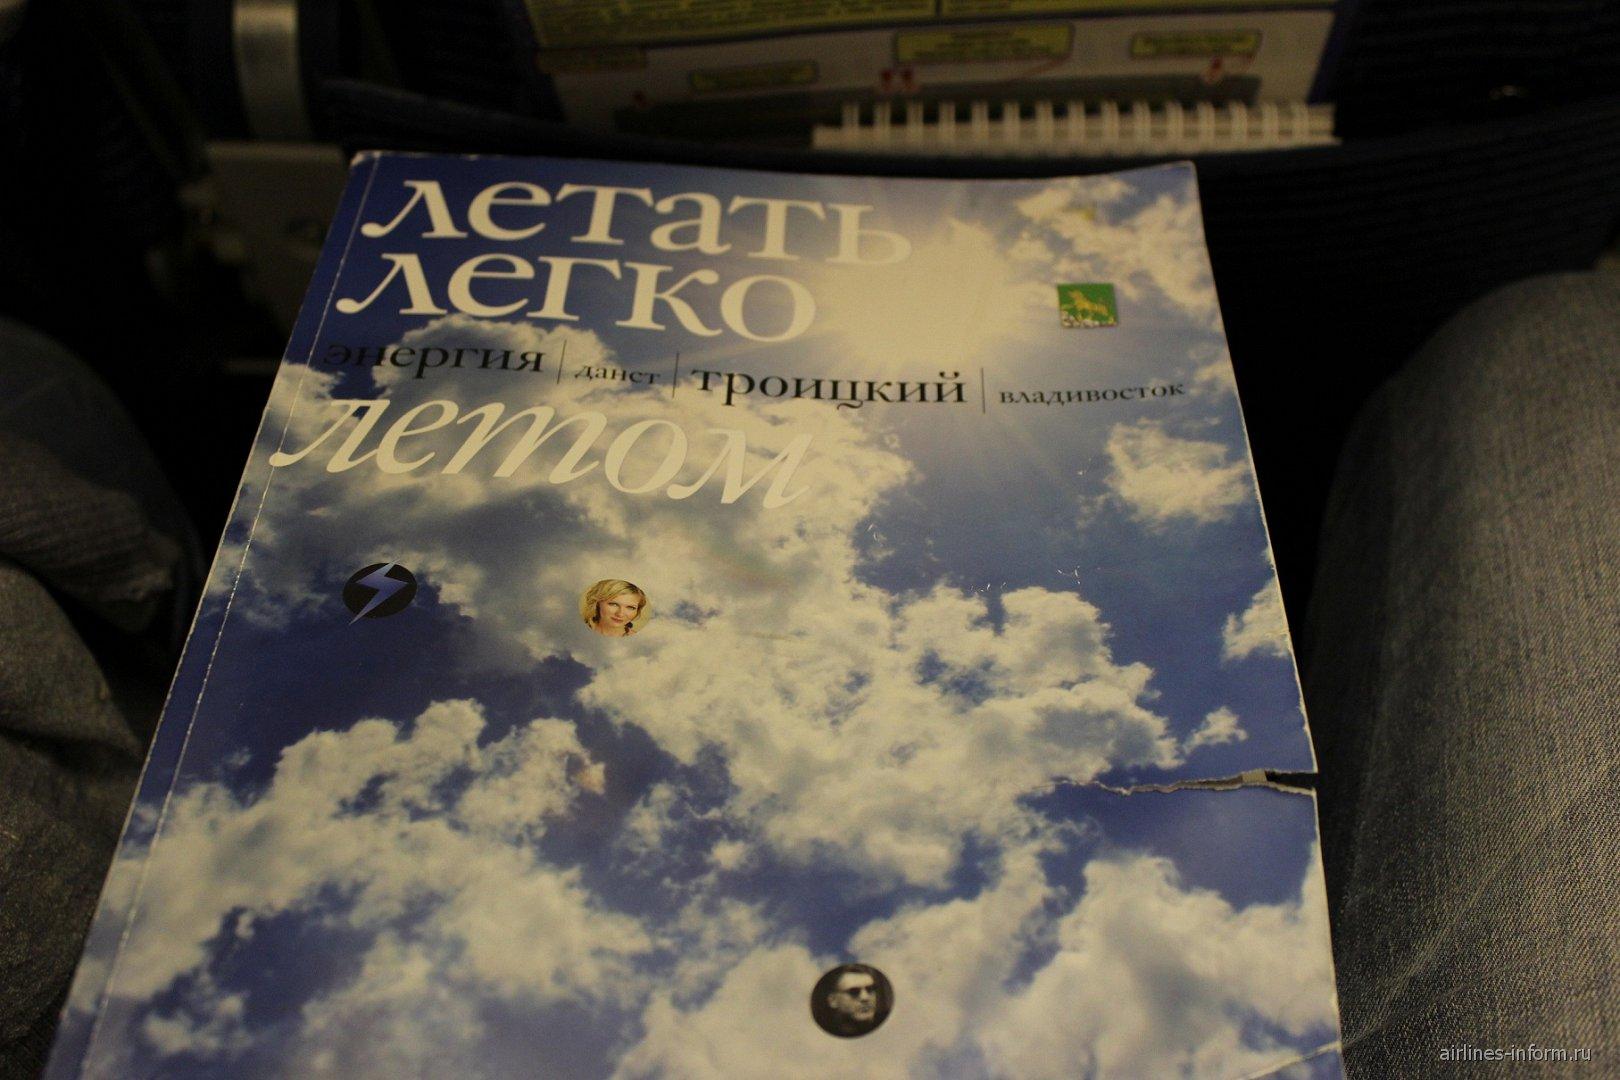 Бортовой журнад авиакомпании NordStar